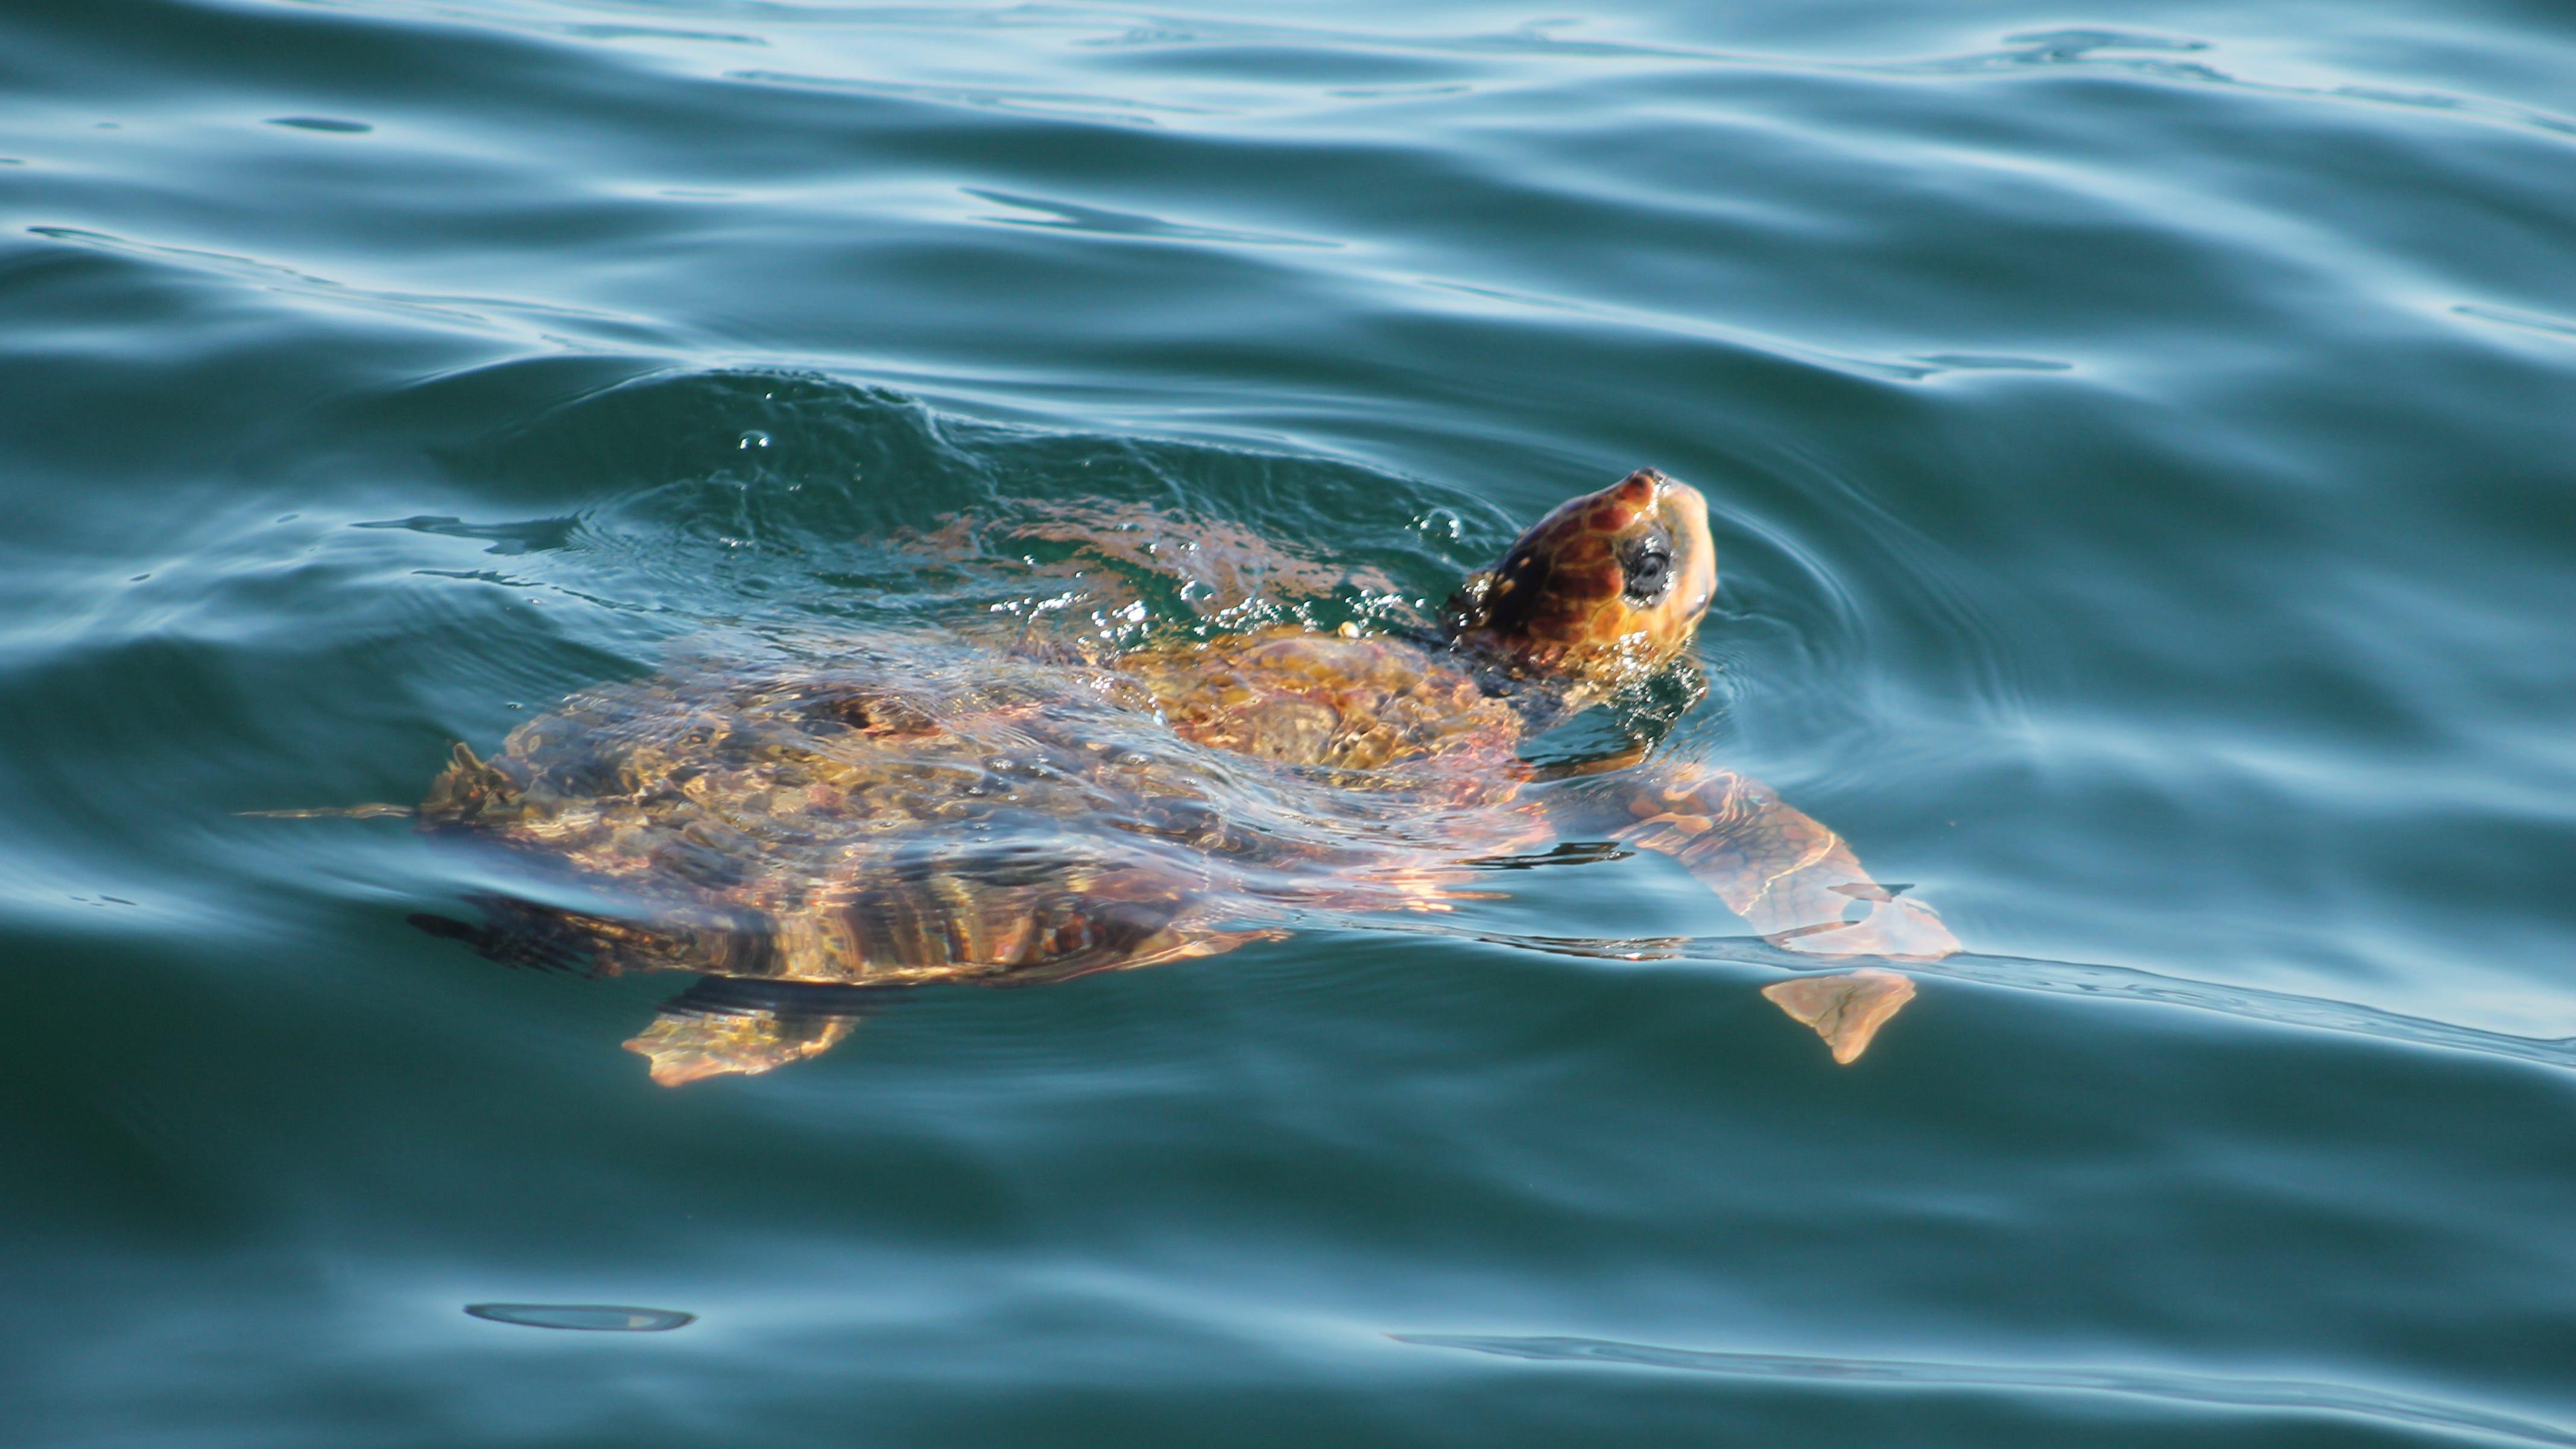 Loggerhead turtle found in Westport died from a boat propeller strike.